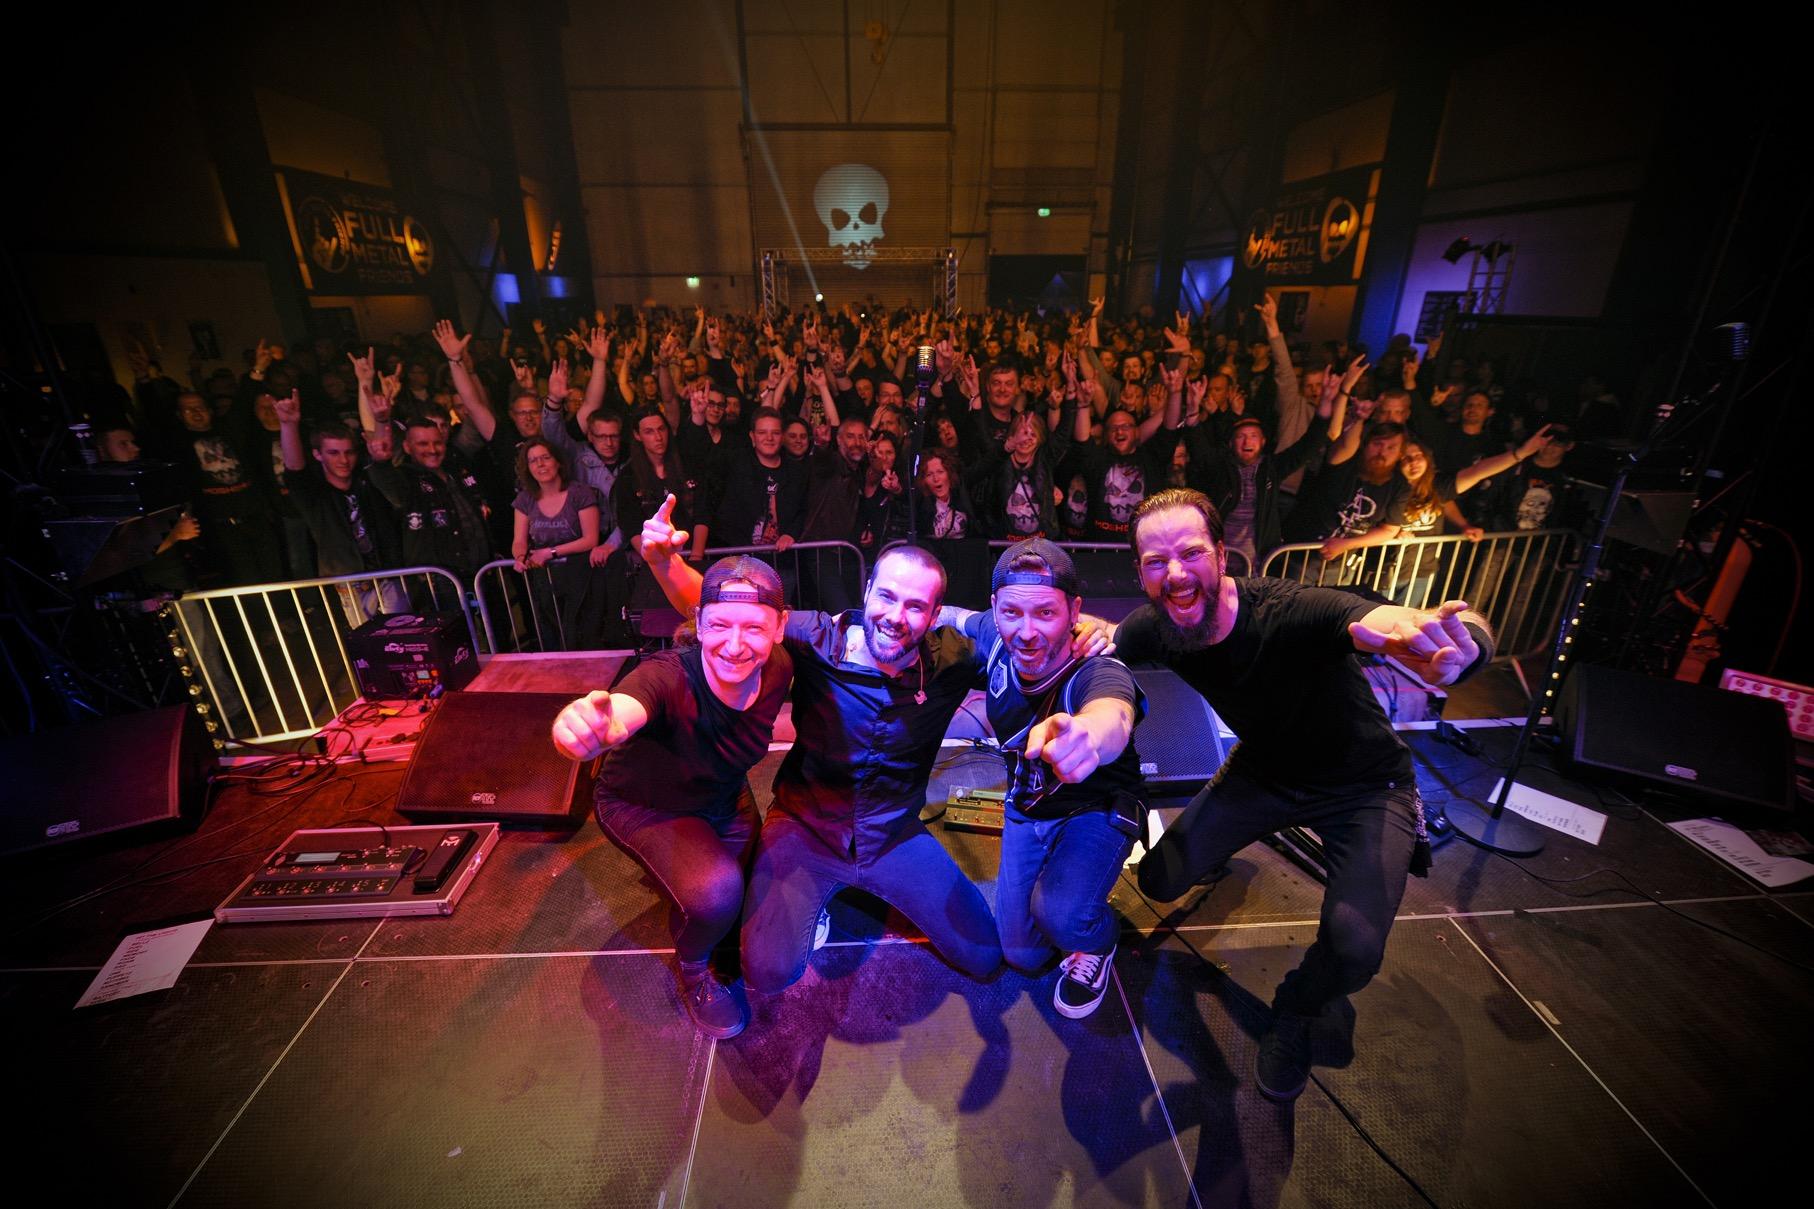 mytallica-mosh-n-may-festival-schapen-deutschland-2019-5374-thank-you-stage